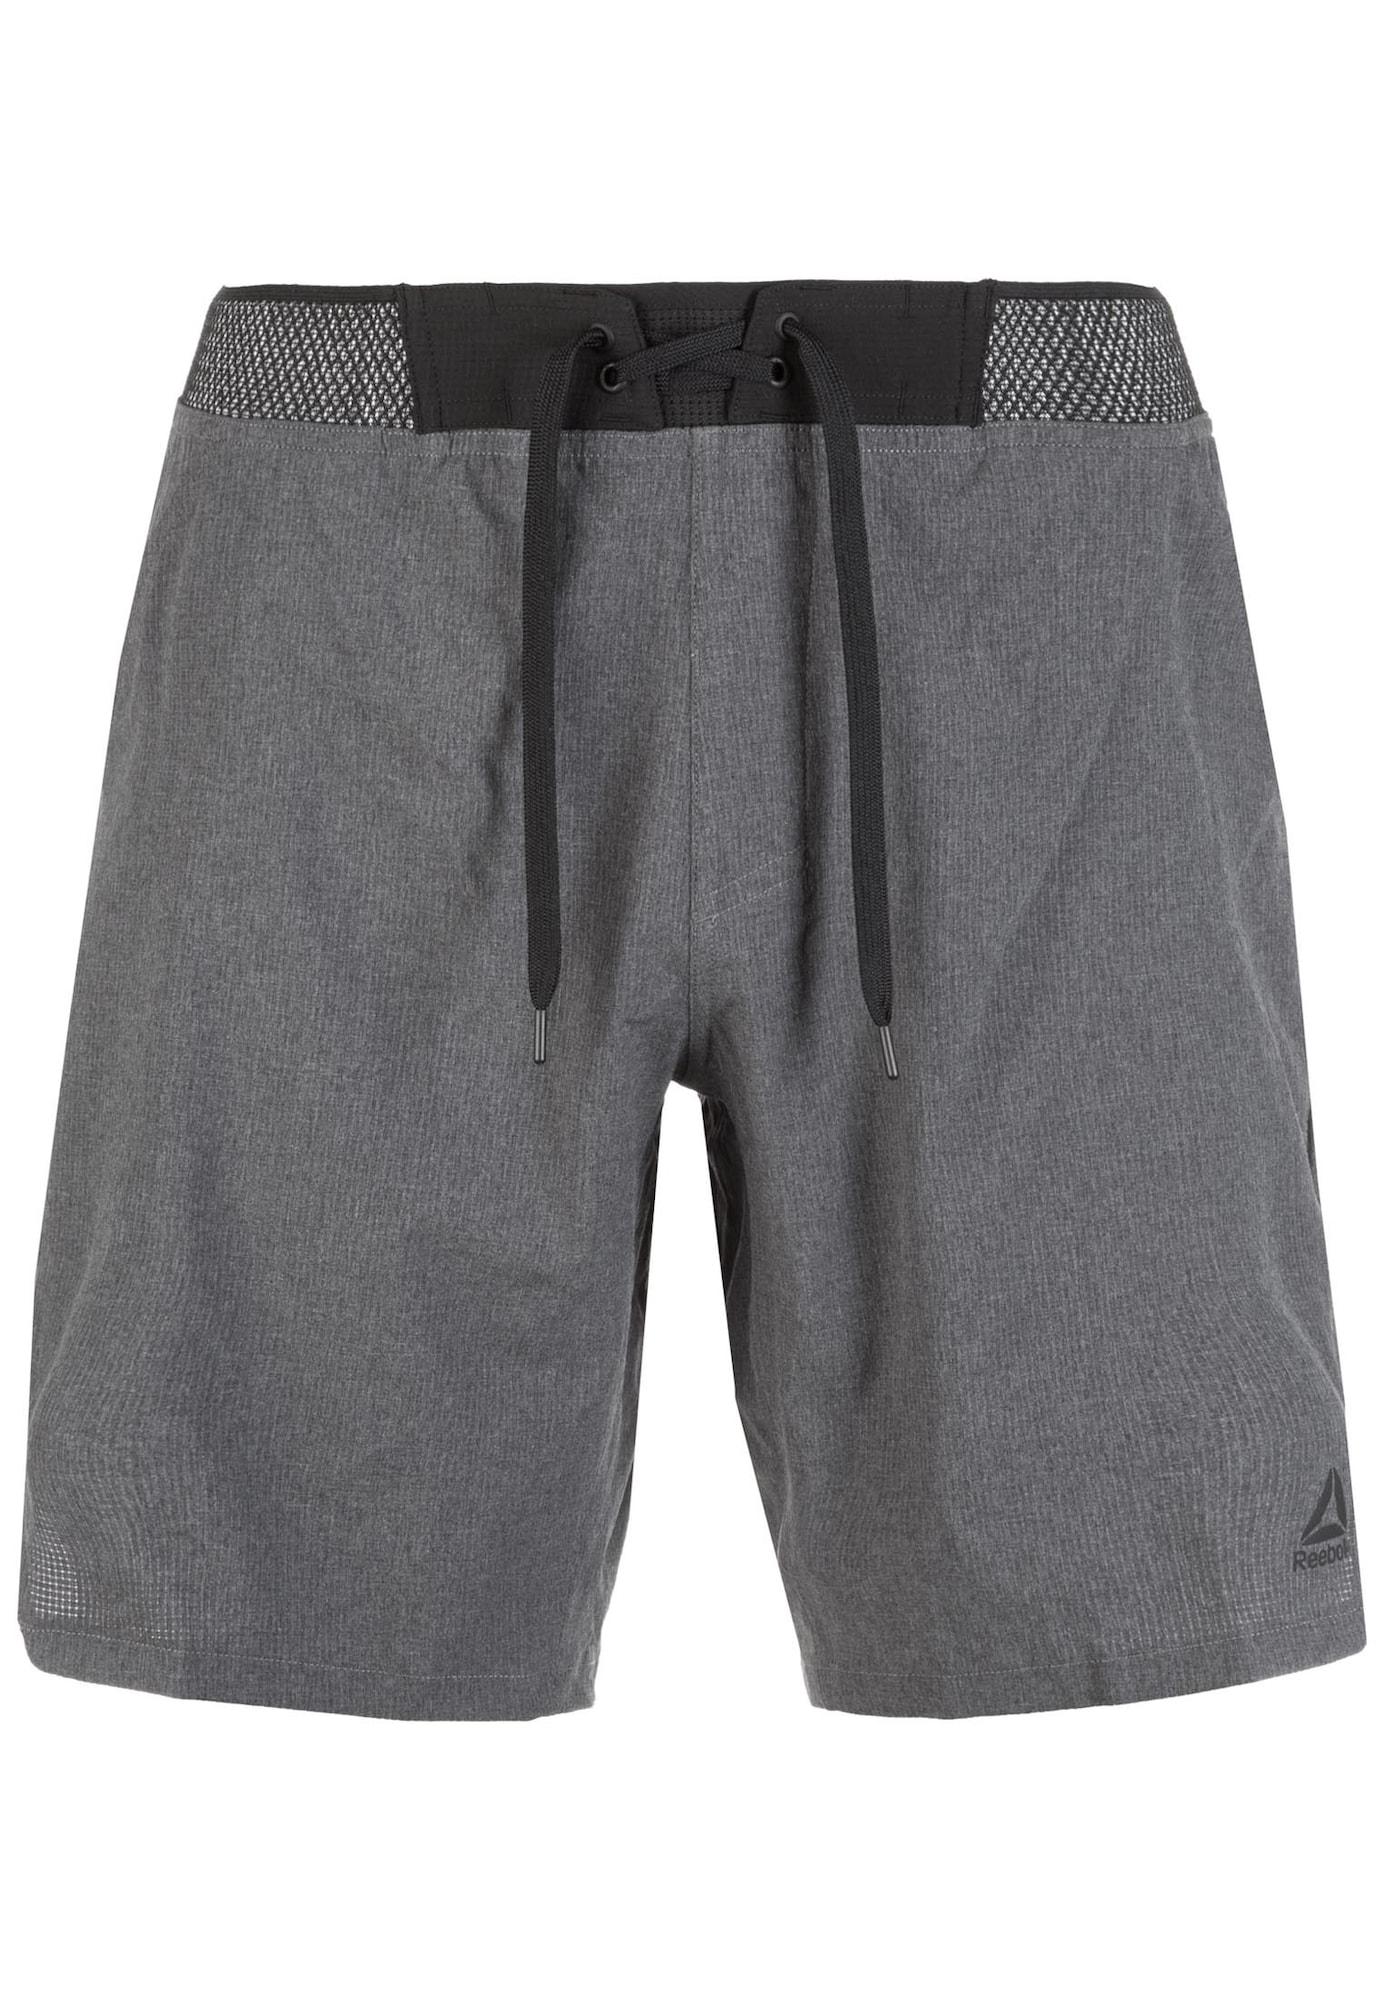 Sportshorts 'Epic Knit Waist' | Sportbekleidung > Sporthosen > Sportshorts | Reebok